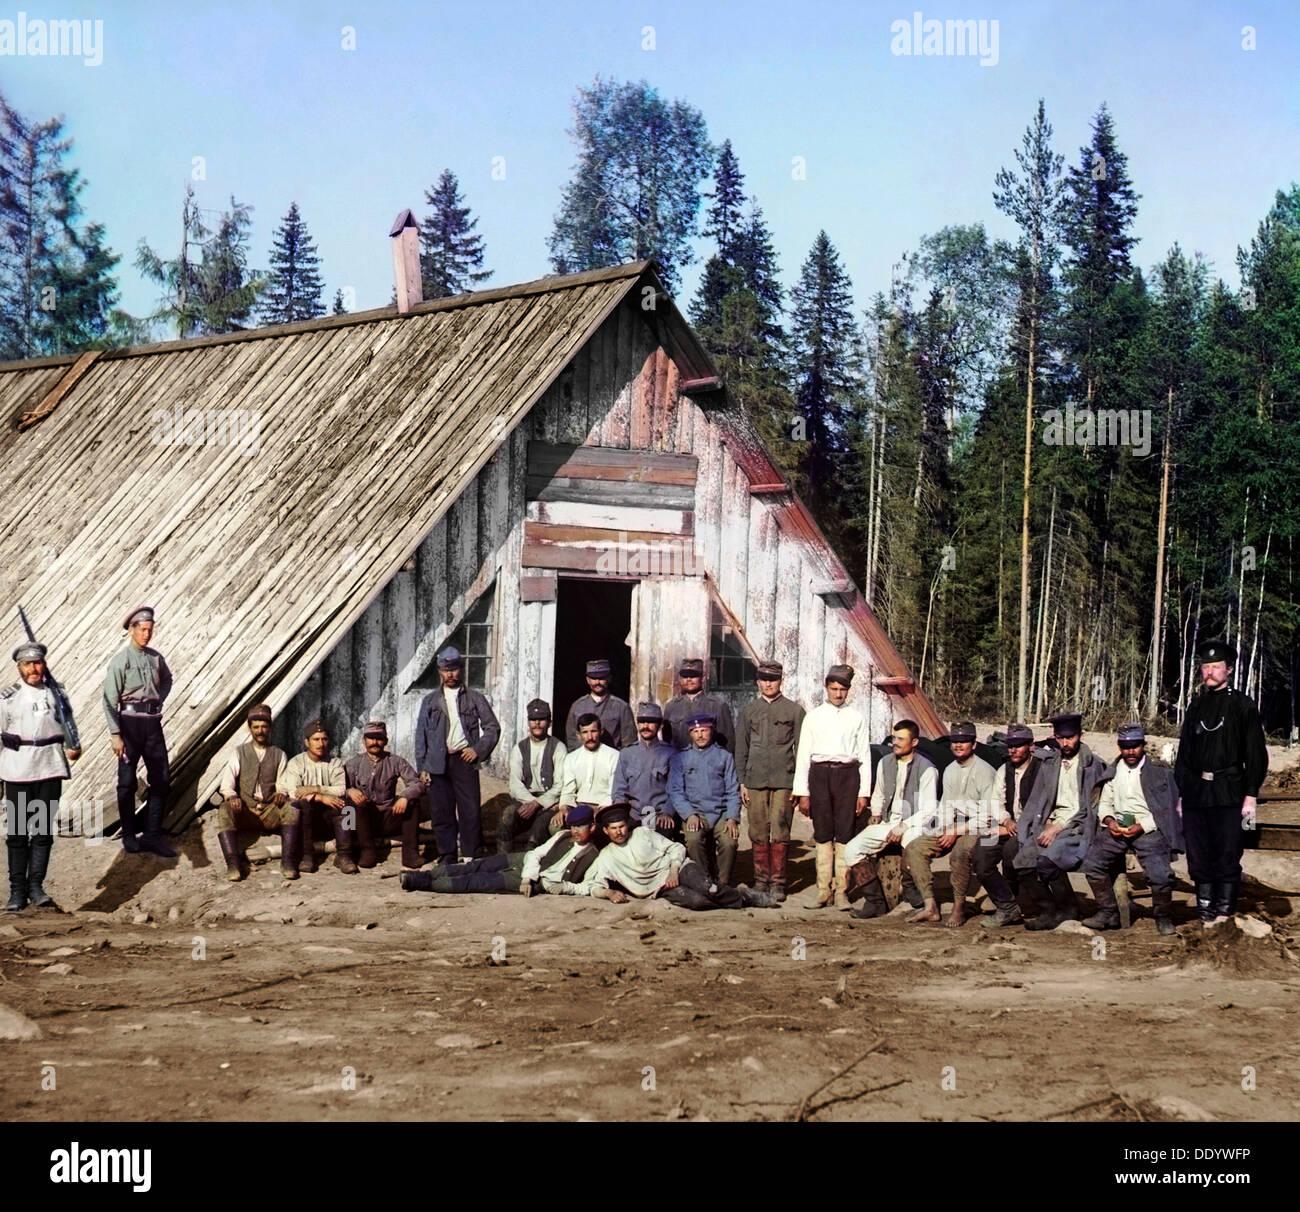 Austro-Hungarian prisoners of war near a barracks, Karelia, Russia, WWI, 1915.  Artist: Sergey Mikhaylovich Prokudin-Gorsky - Stock Image